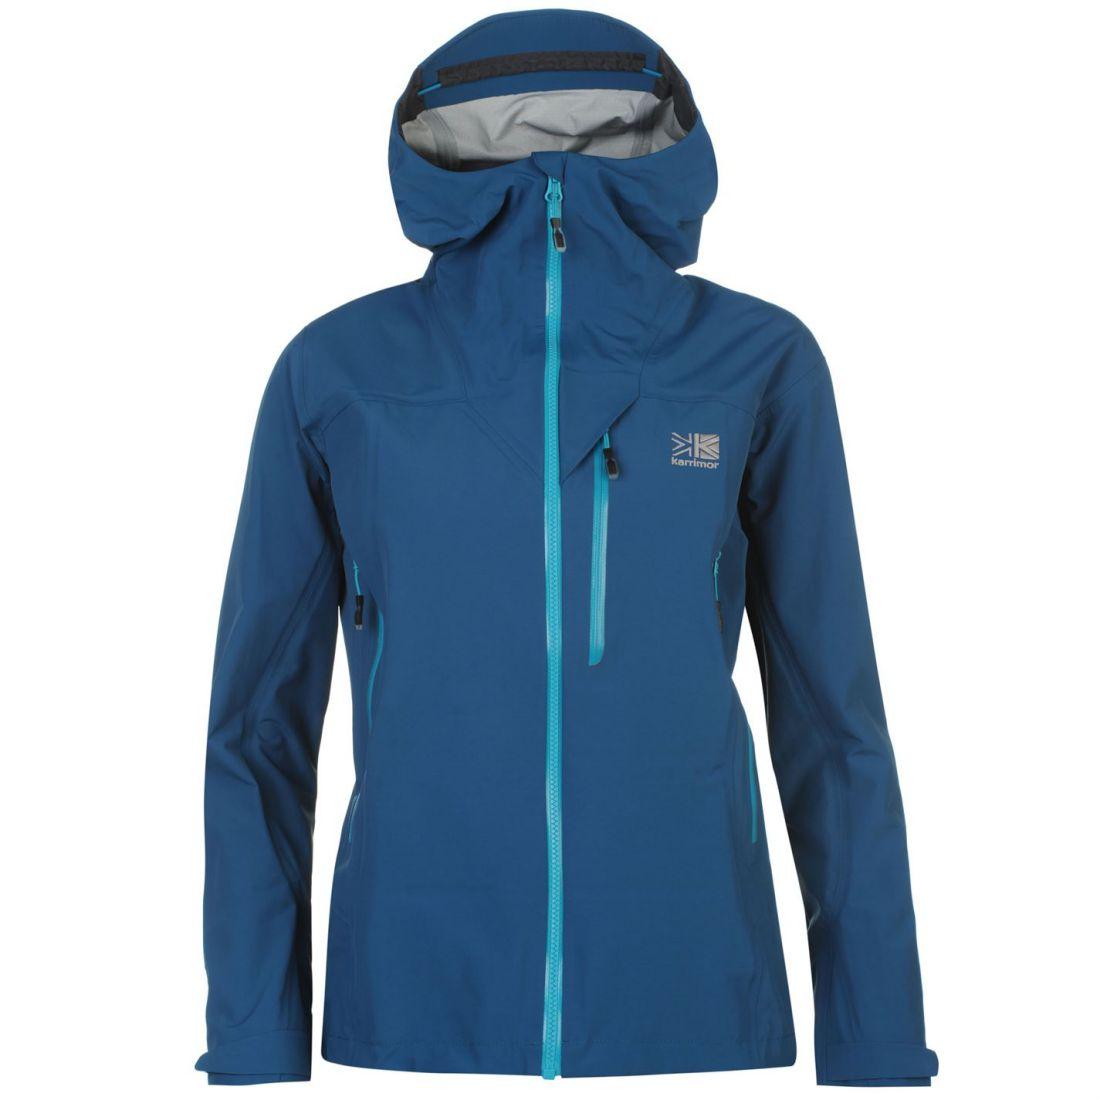 Karrimor Ladies Hot Rock Jacket Weather Resistant Breathable Hooded Zipped